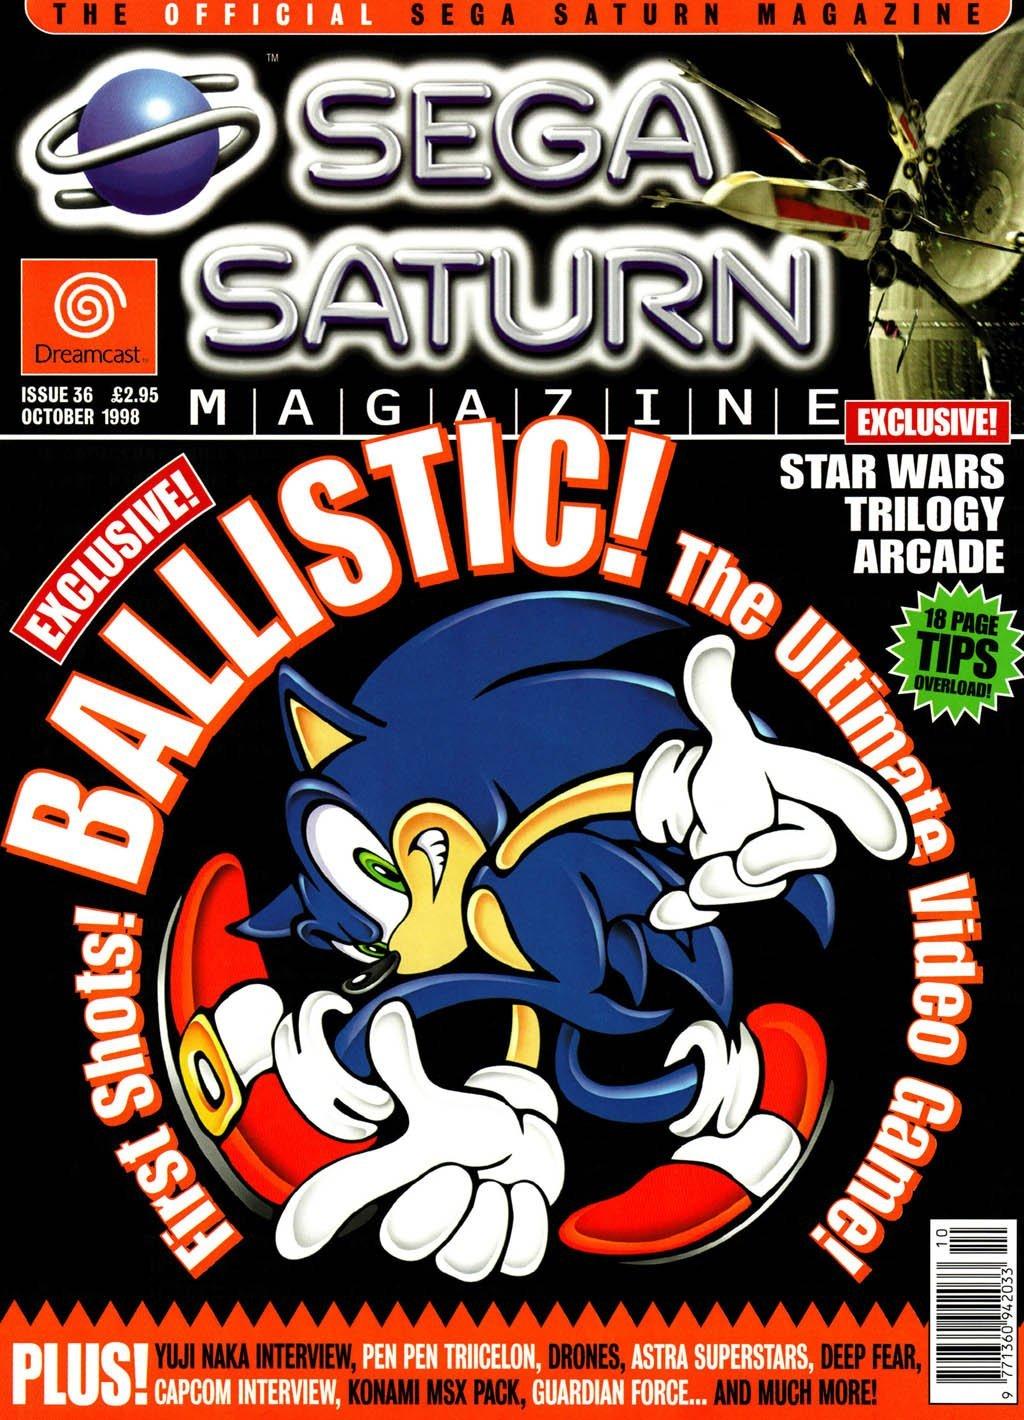 Official Sega Saturn Magazine 36 (October 1998)